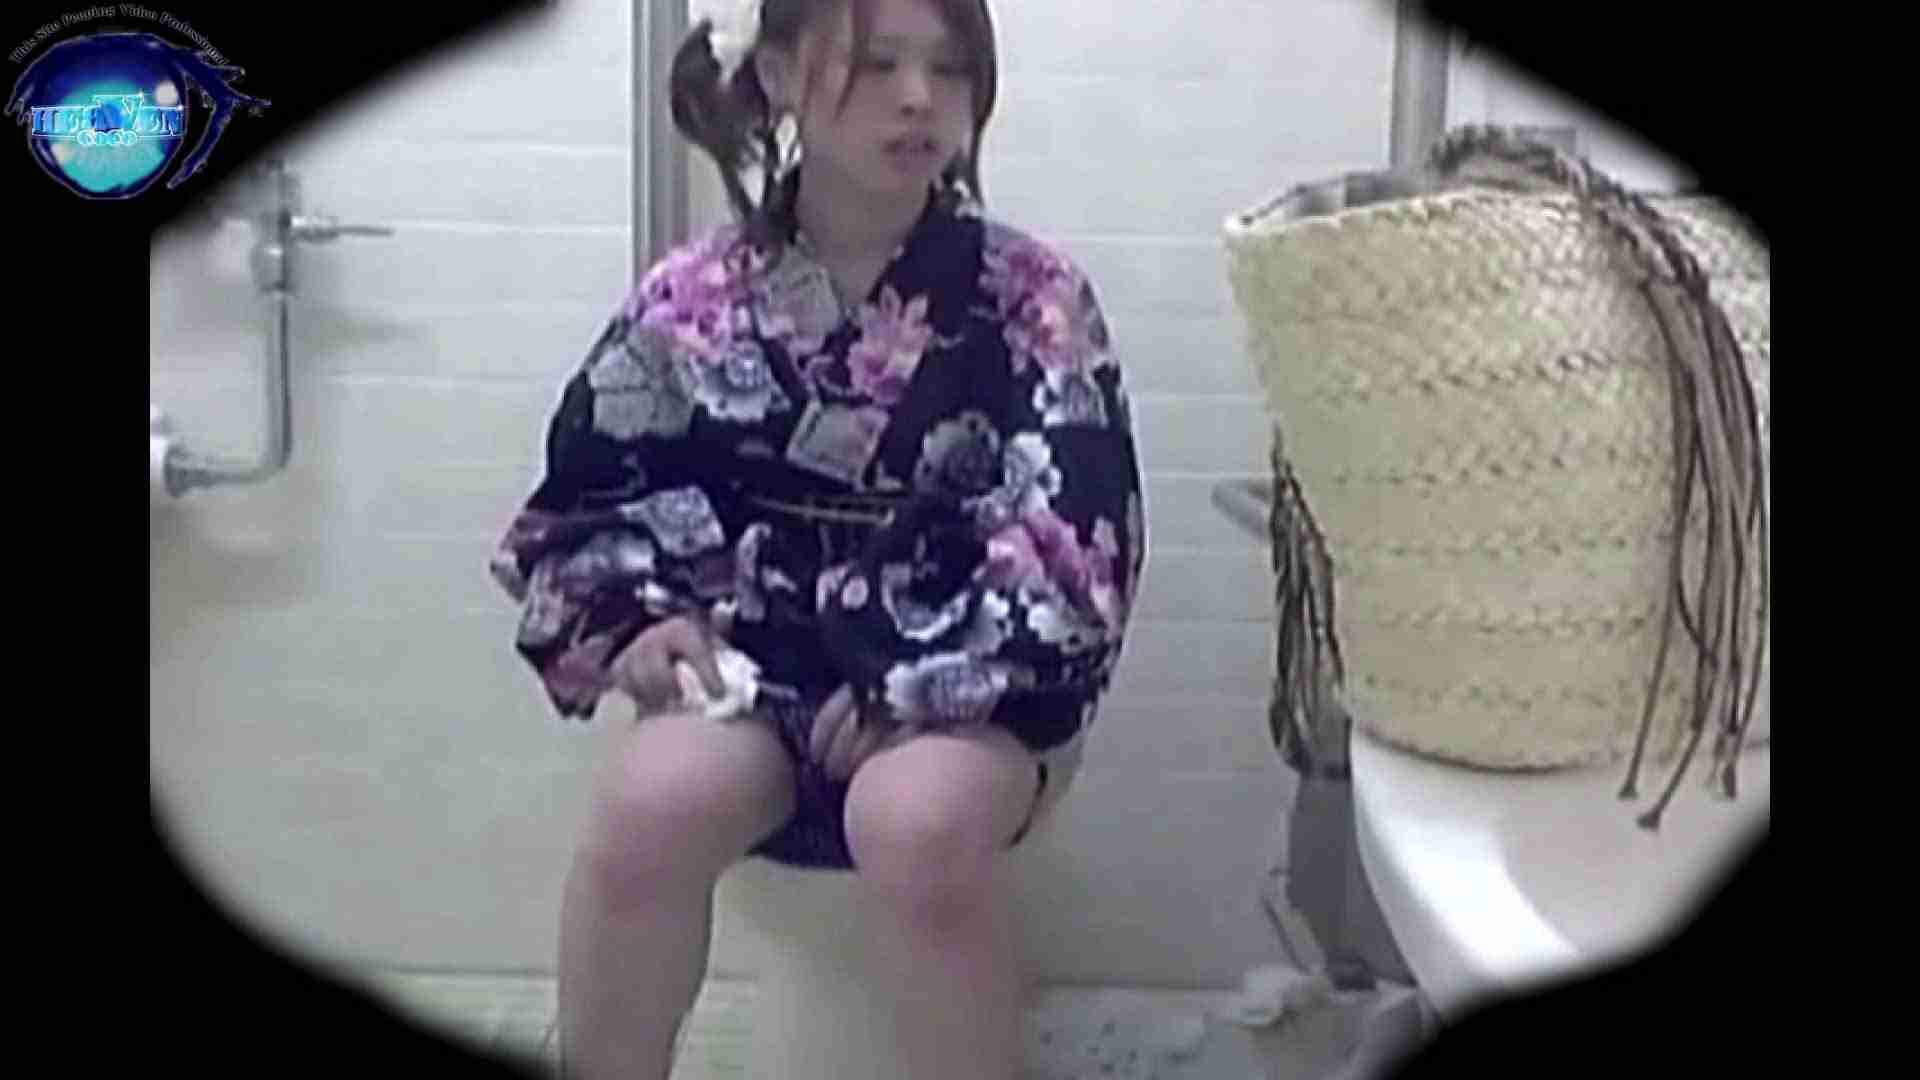 teen galトイレ覗き紙がナイ編‼vol.17 OL女体 AV無料動画キャプチャ 93連発 54